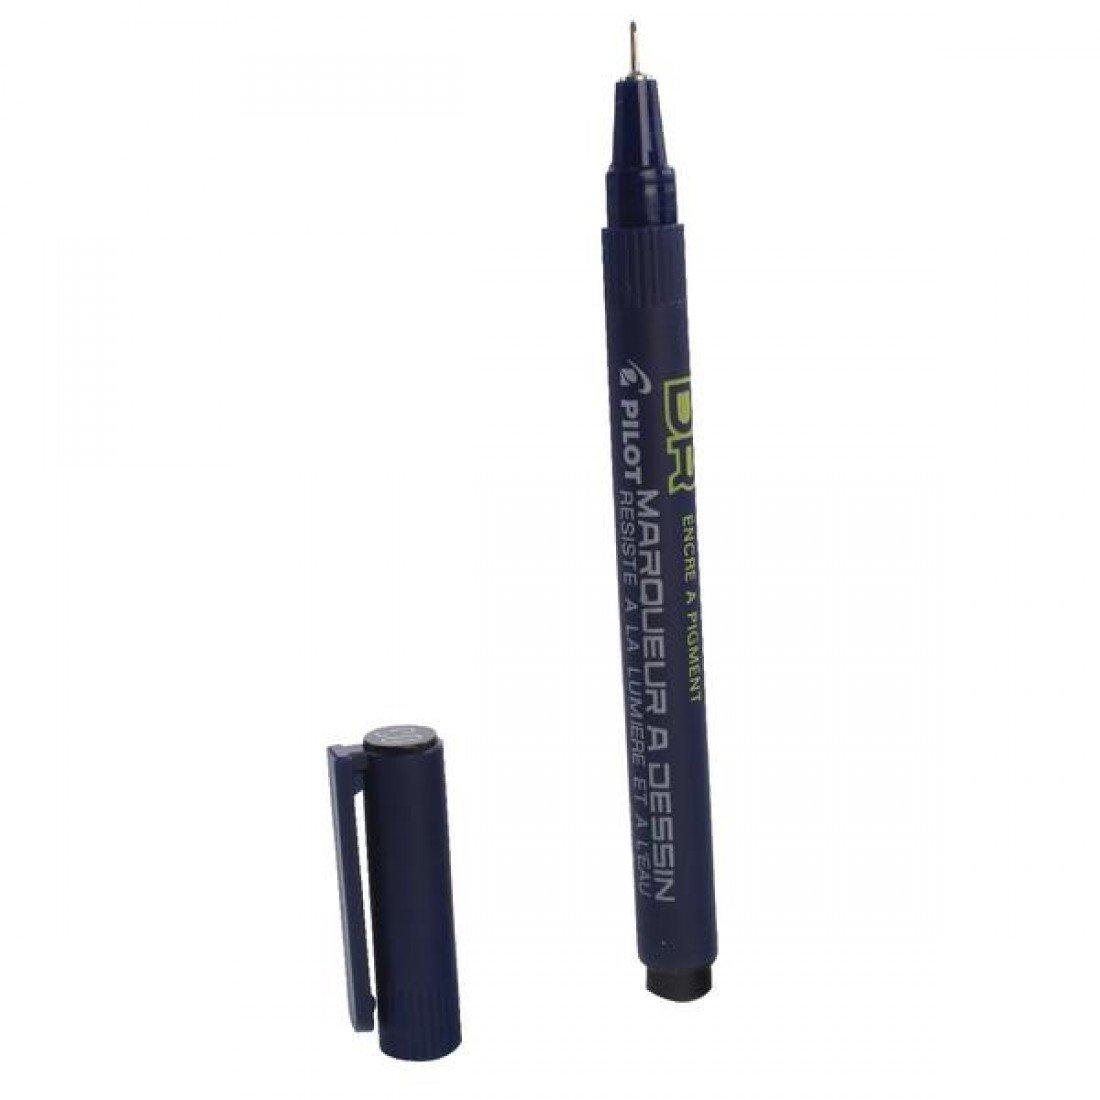 Pilot DR Drawing Pen Black Pigment Ink Pack of 5 Case 0.1, 0.2, 0.3, 0.5, 0.8